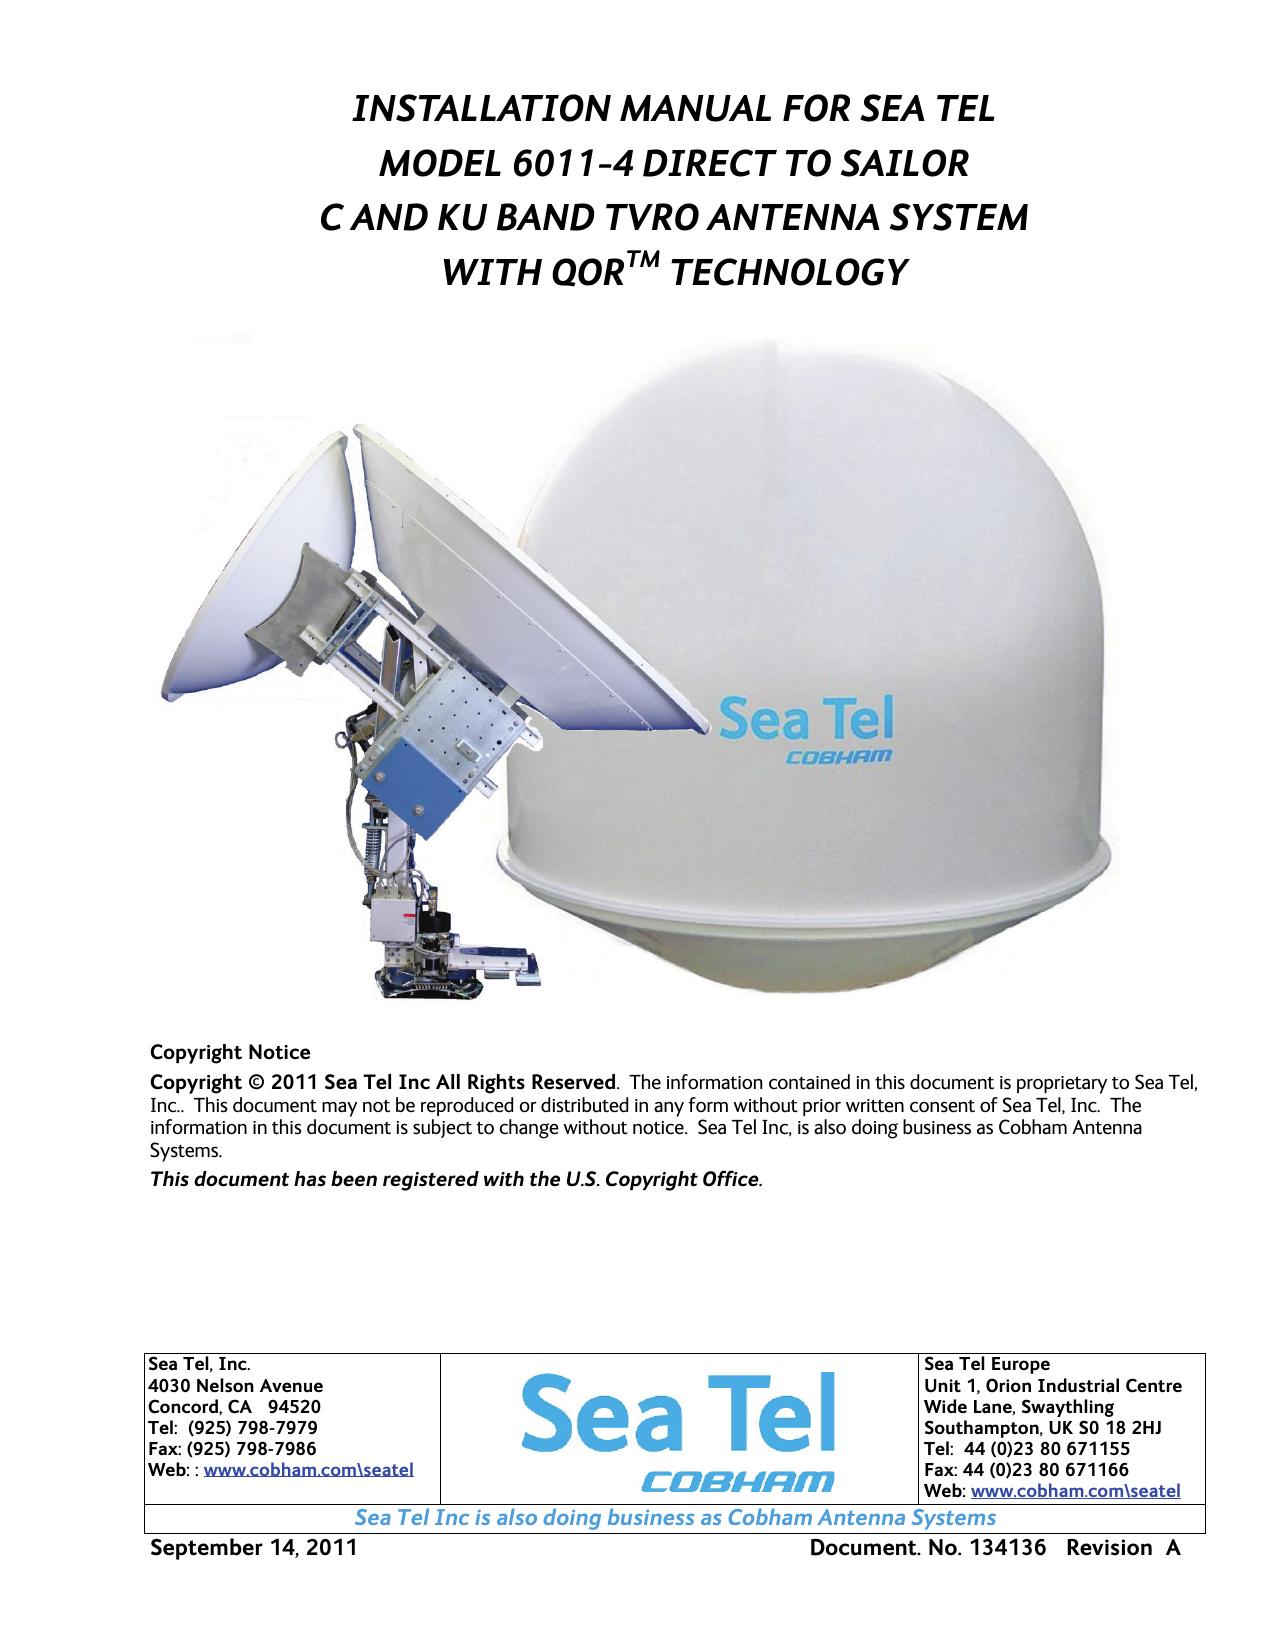 jvc rc qs22 manual rh jvc rc qs22 manual filmaustin us Haynes Automotive Repair Manuals Product Radar Detector Manuals